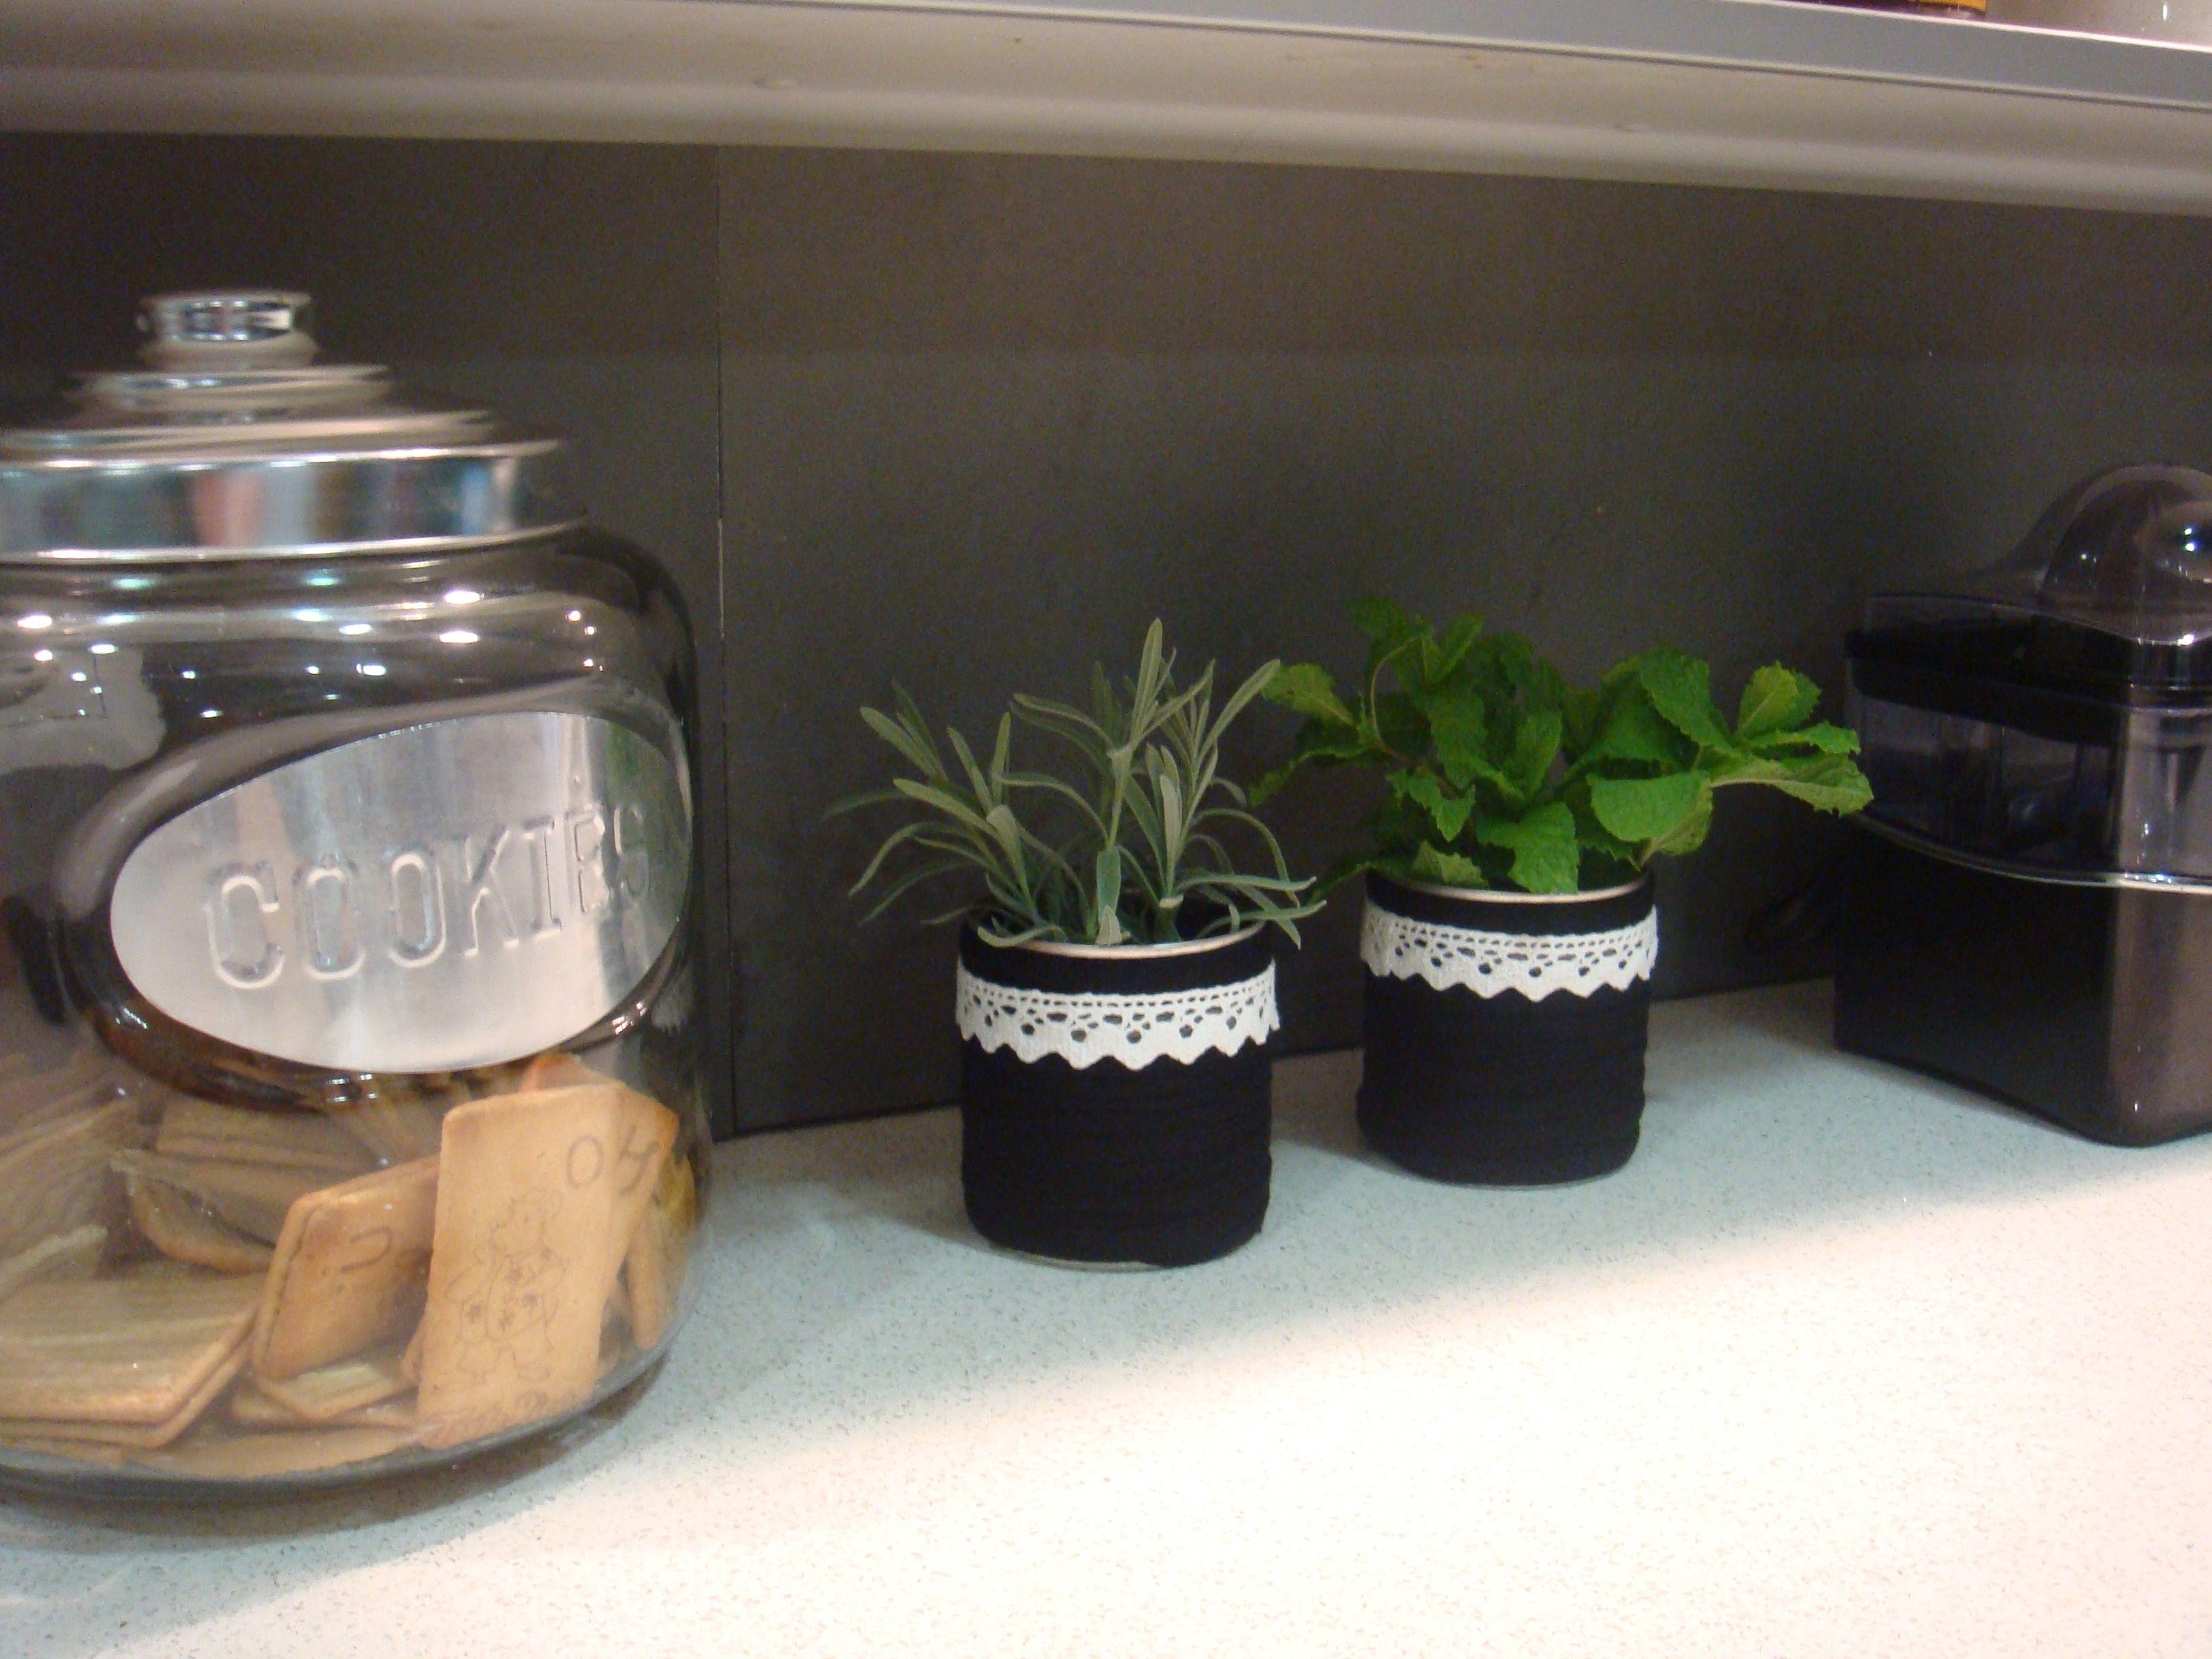 Funcionalidade: vaso com planta aromática